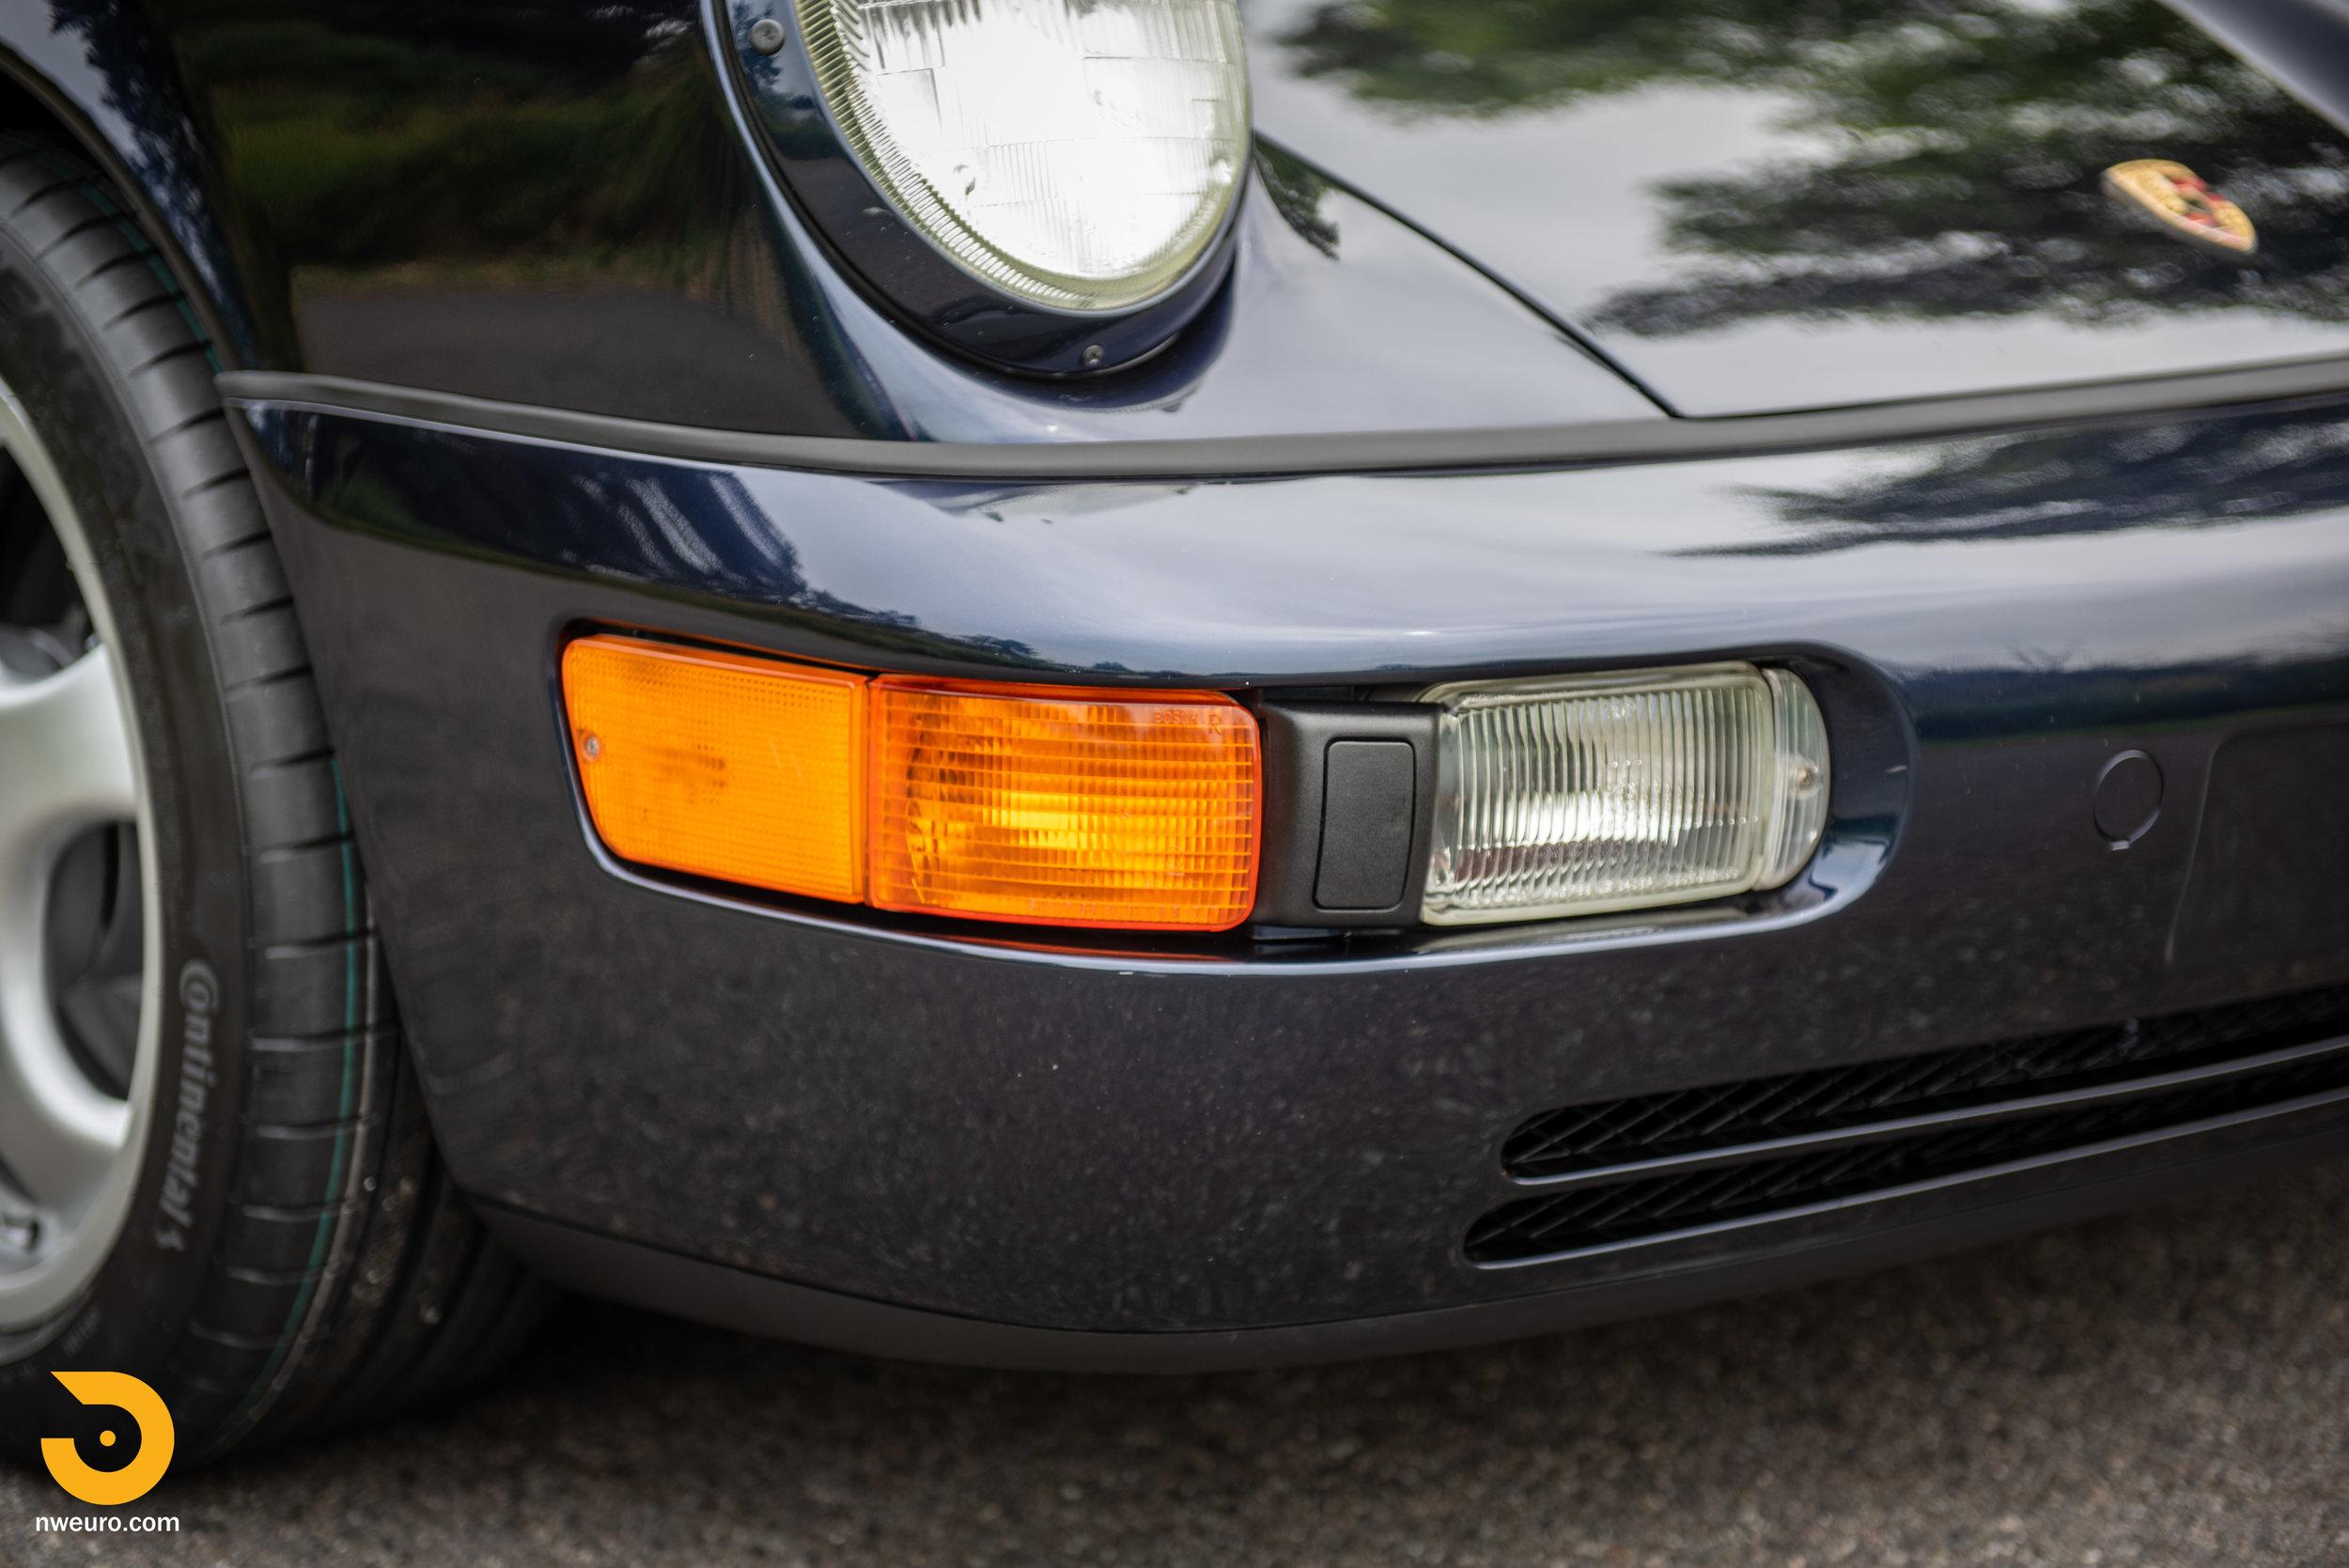 1993 Porsche RS America Midnight Blue-15.jpg